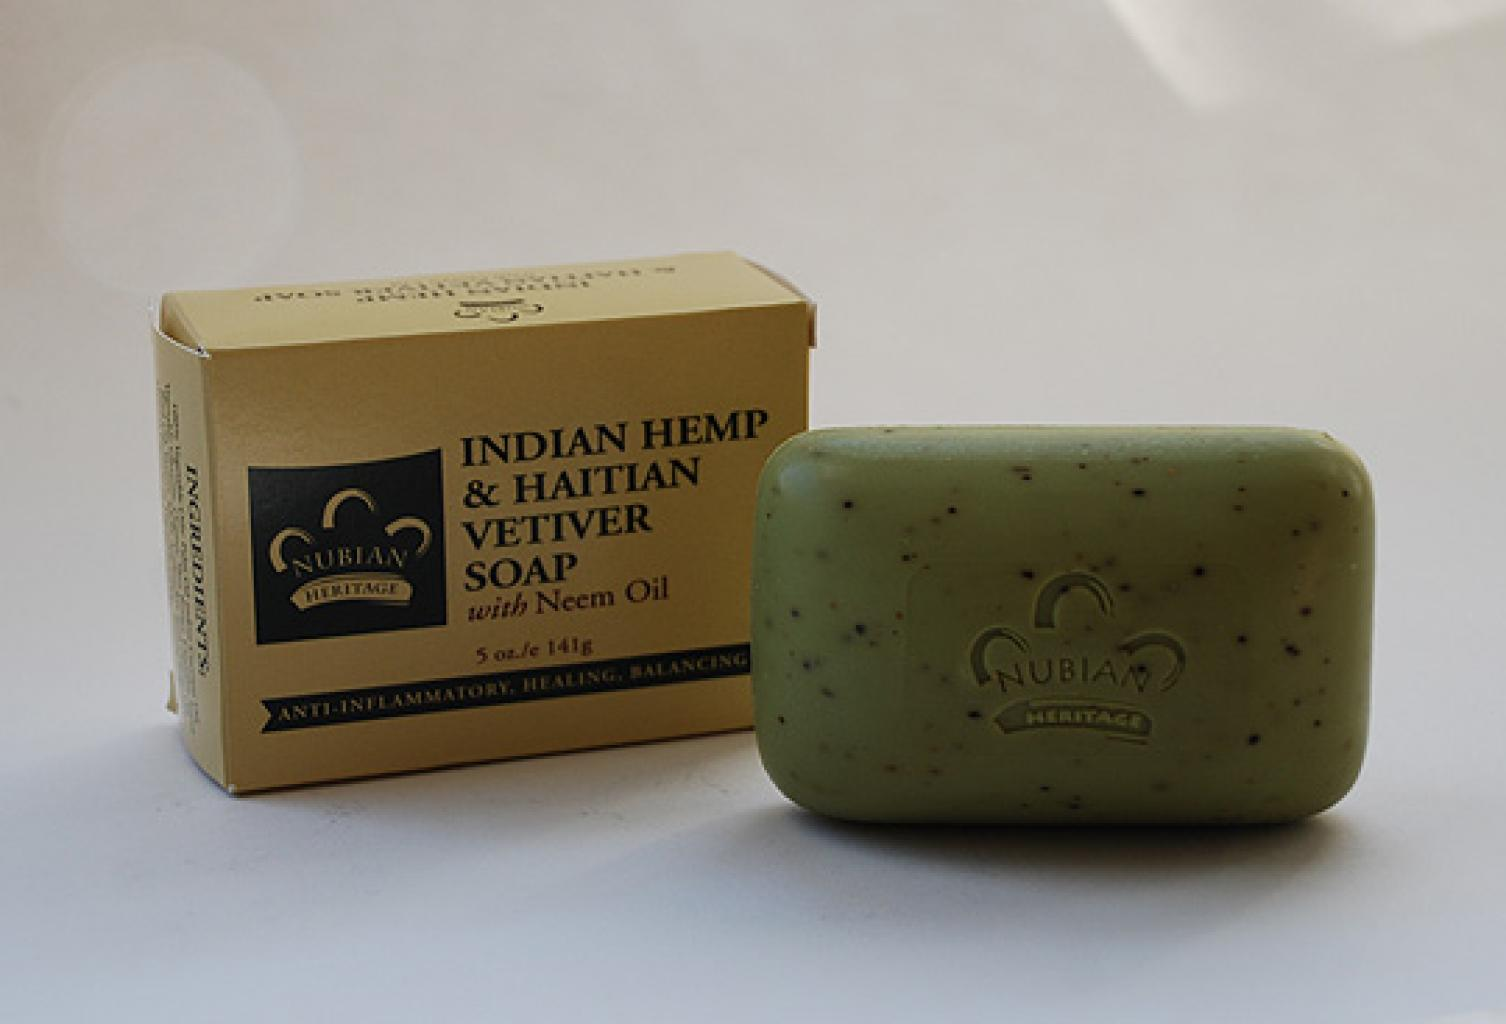 Indian Hemp and Haitian Vetiver Soap gi519